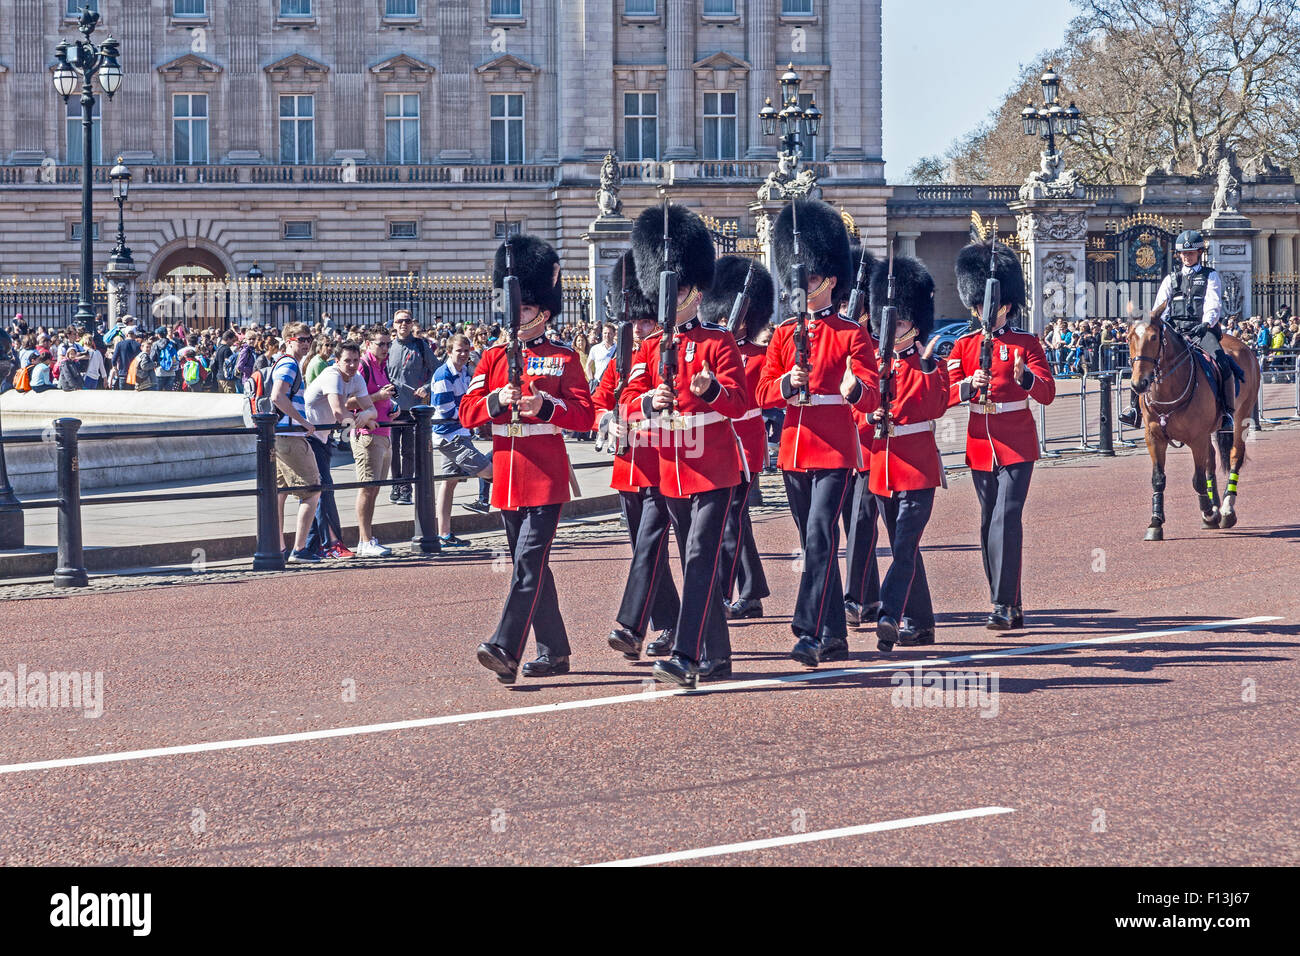 A troop of guardsmen parading near Buckingham Palace - Stock Image